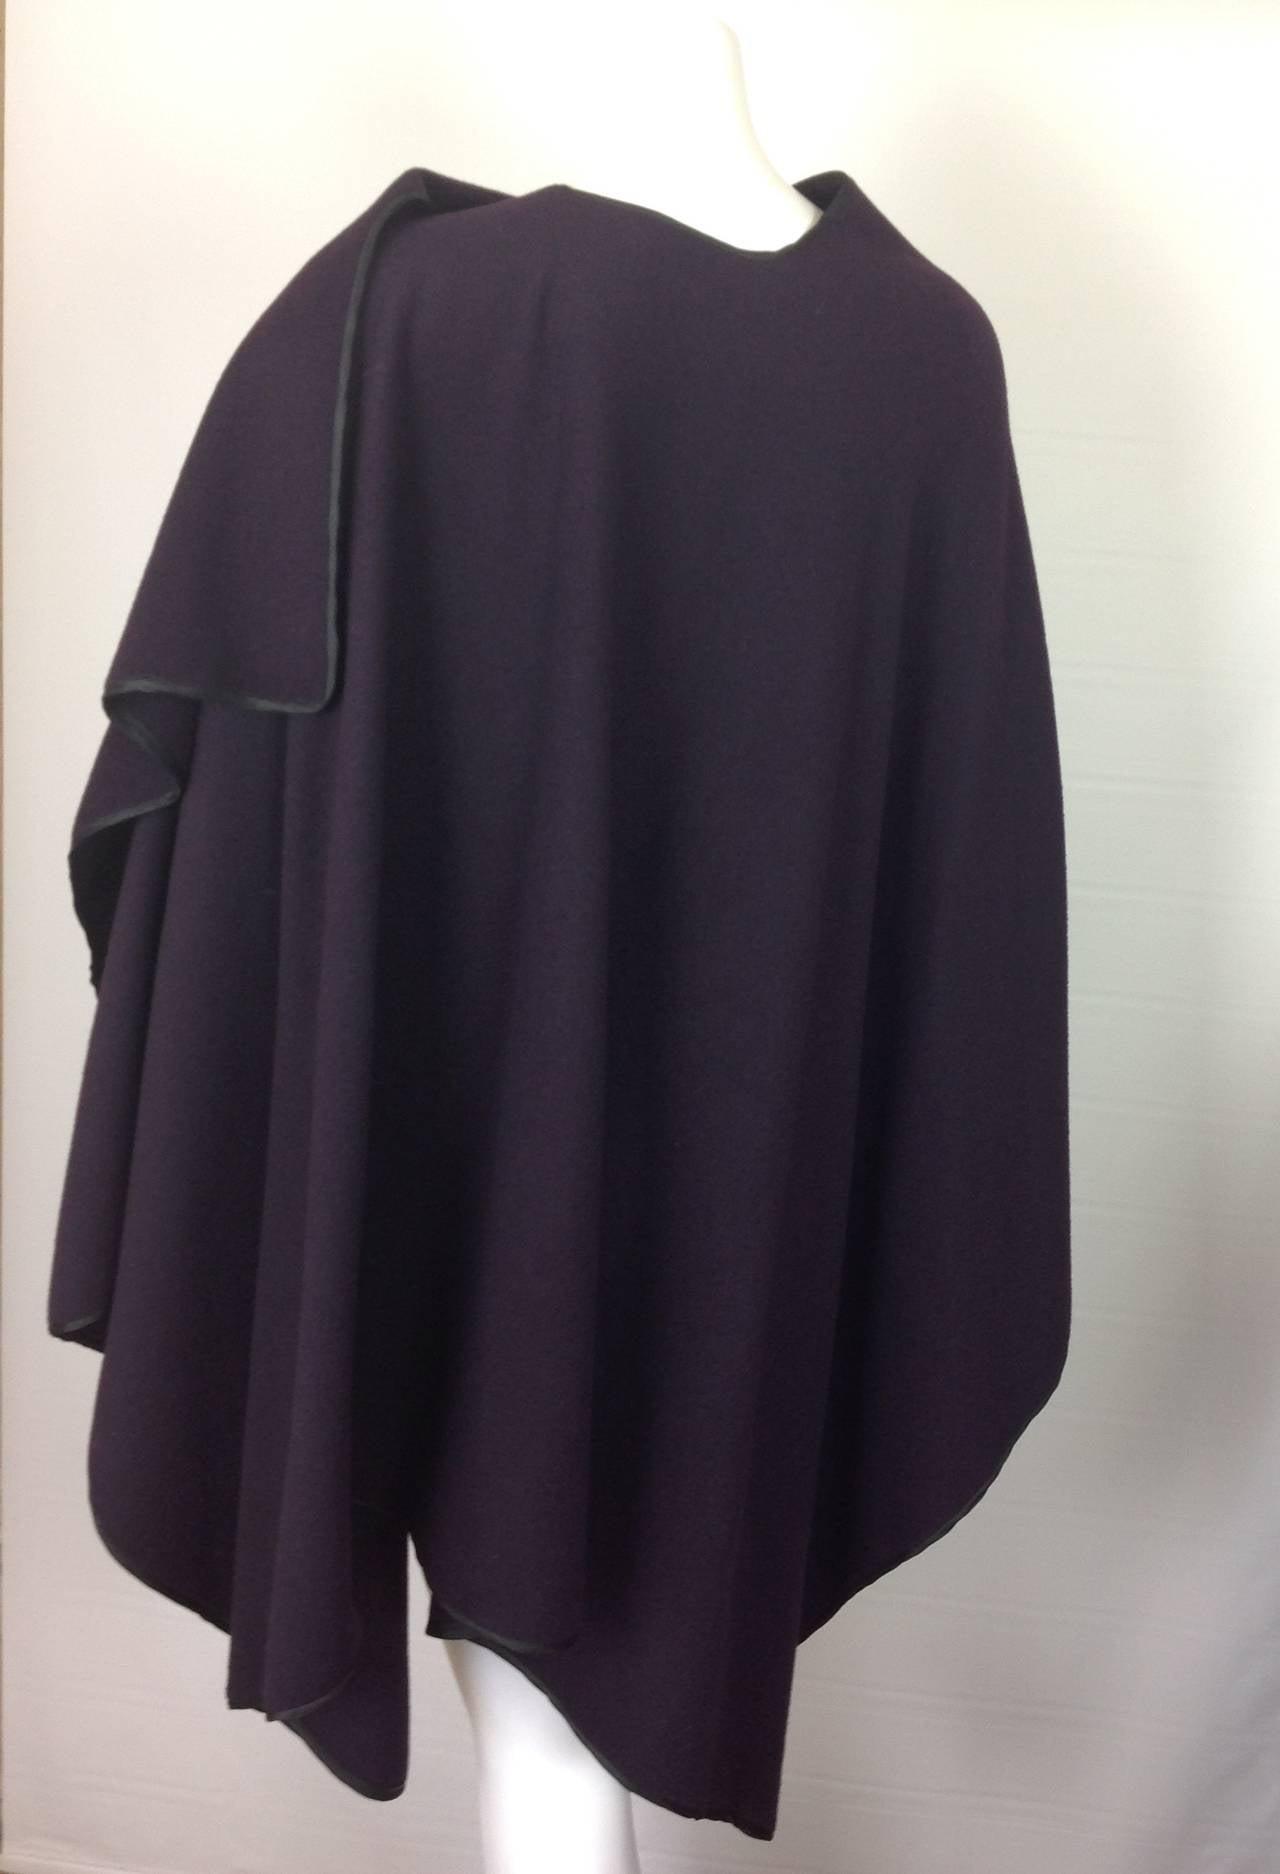 Capas Sesena violet poncho 3